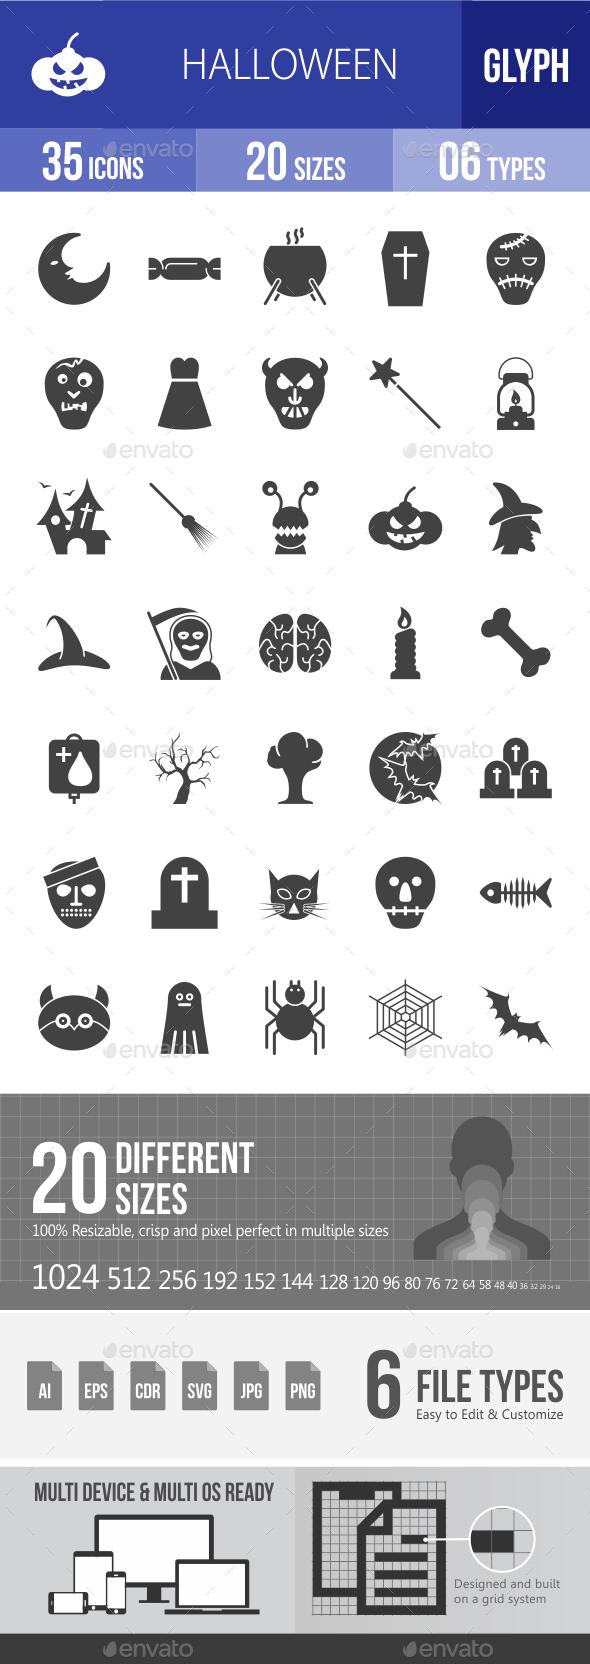 Halloween Glyph Icons - Icons